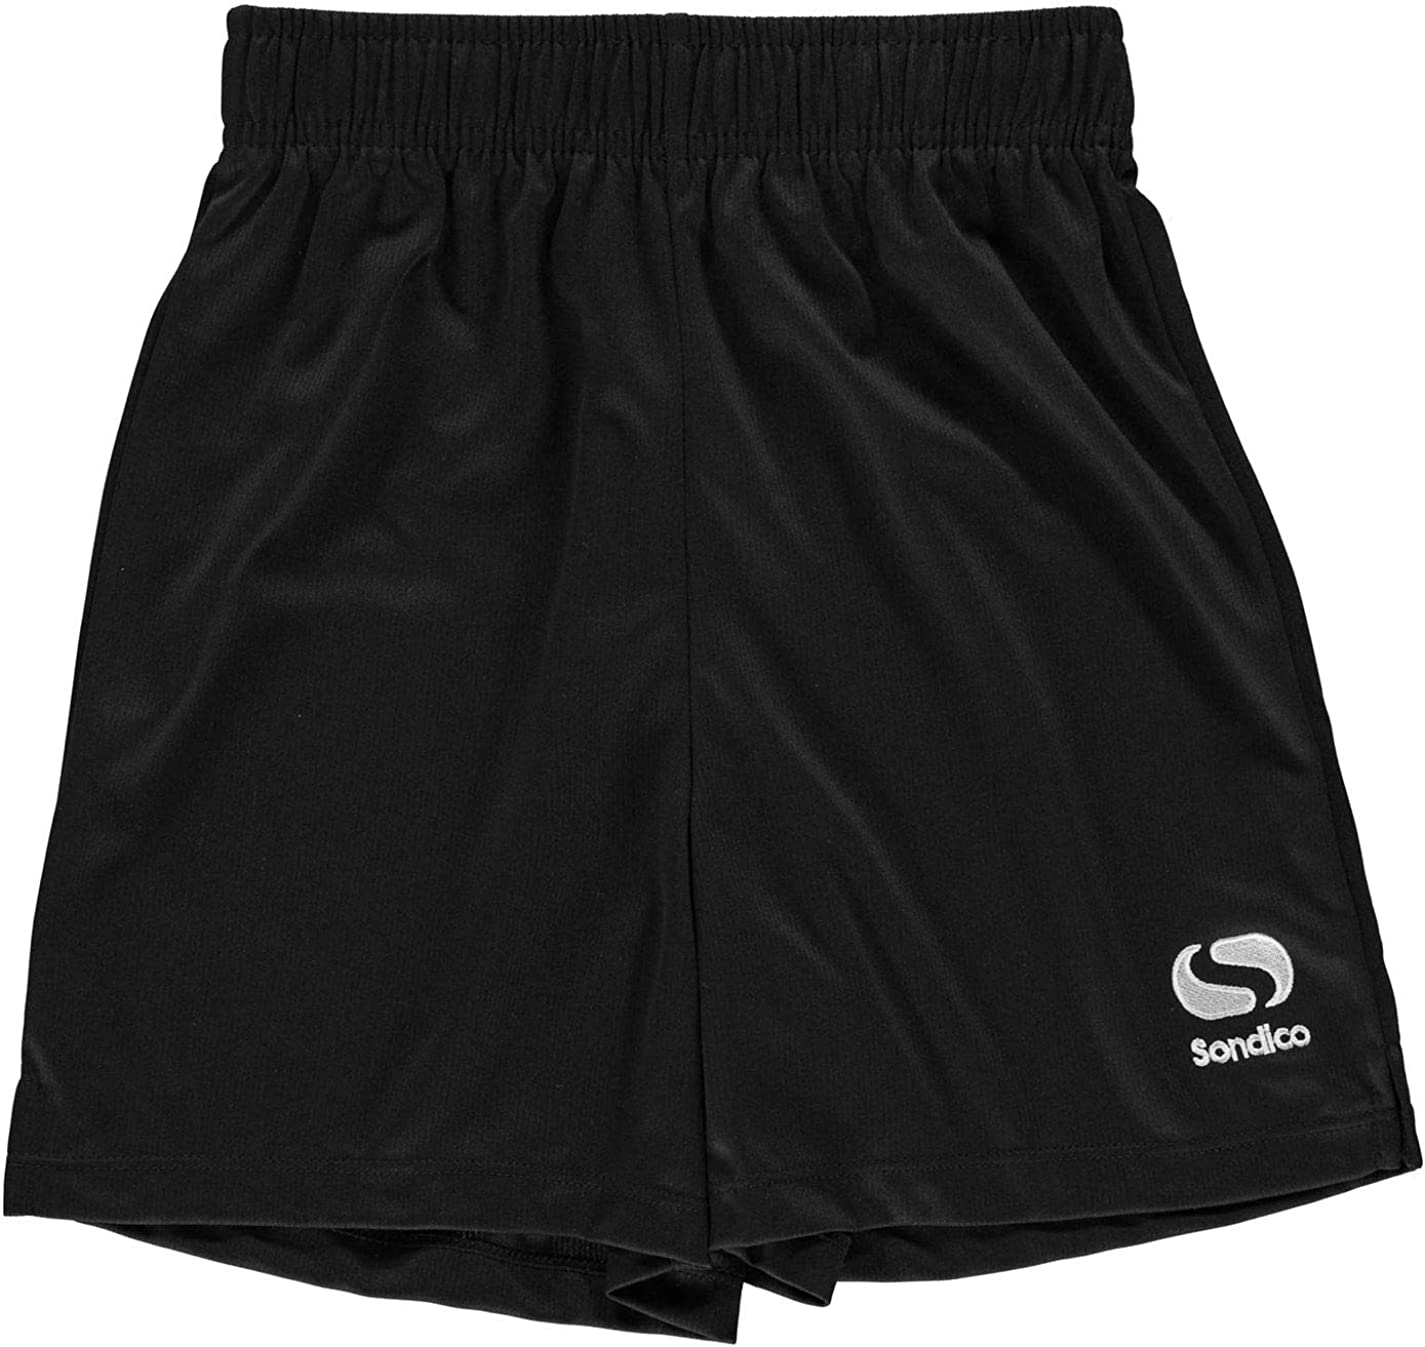 Sondico New mail order Memphis Mall Kids Core Fb Shorts Footbal Juniors Sports Training Boys